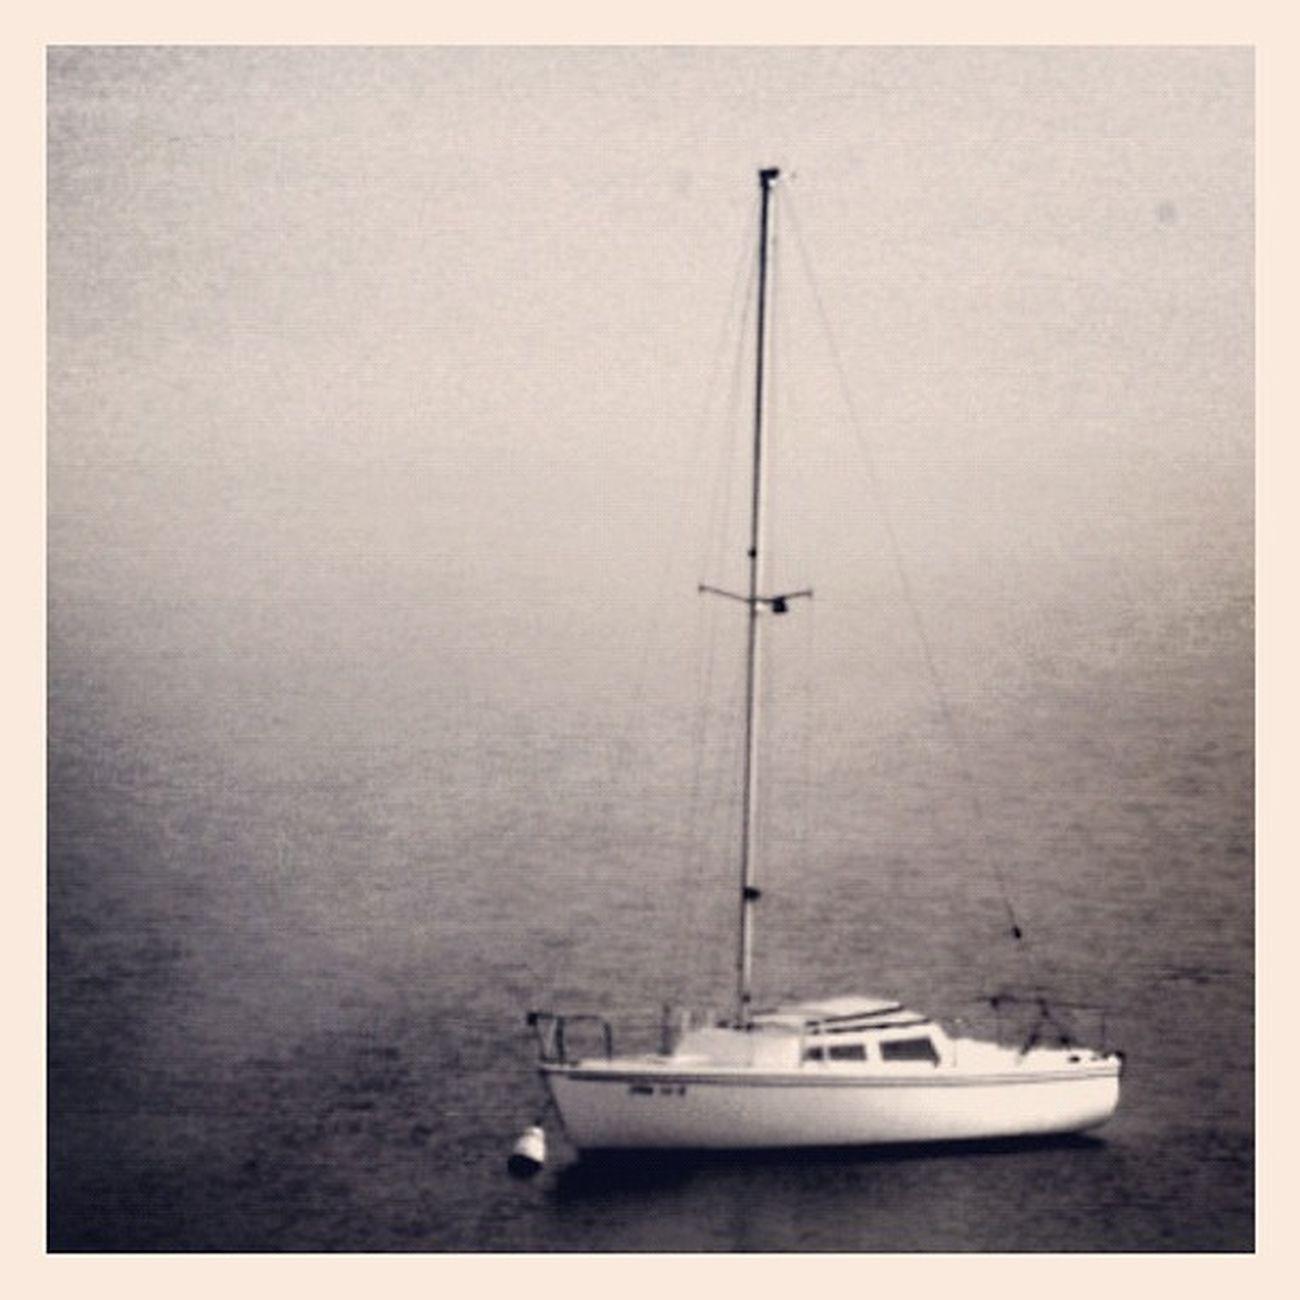 Sierra Lake (metaphorically speaking) #sail #sailboat #sierra #igersmichigan #up Sierra Gmy Photooftheday Instamillion Sailboat Jj_forum_0362 Sail Sweetsierra GCS Igers IGDaily Jj  Instagood Igscout Instaaaaah Instagramhub Jj_forum The_guild Primeshots Up Igersmichigan